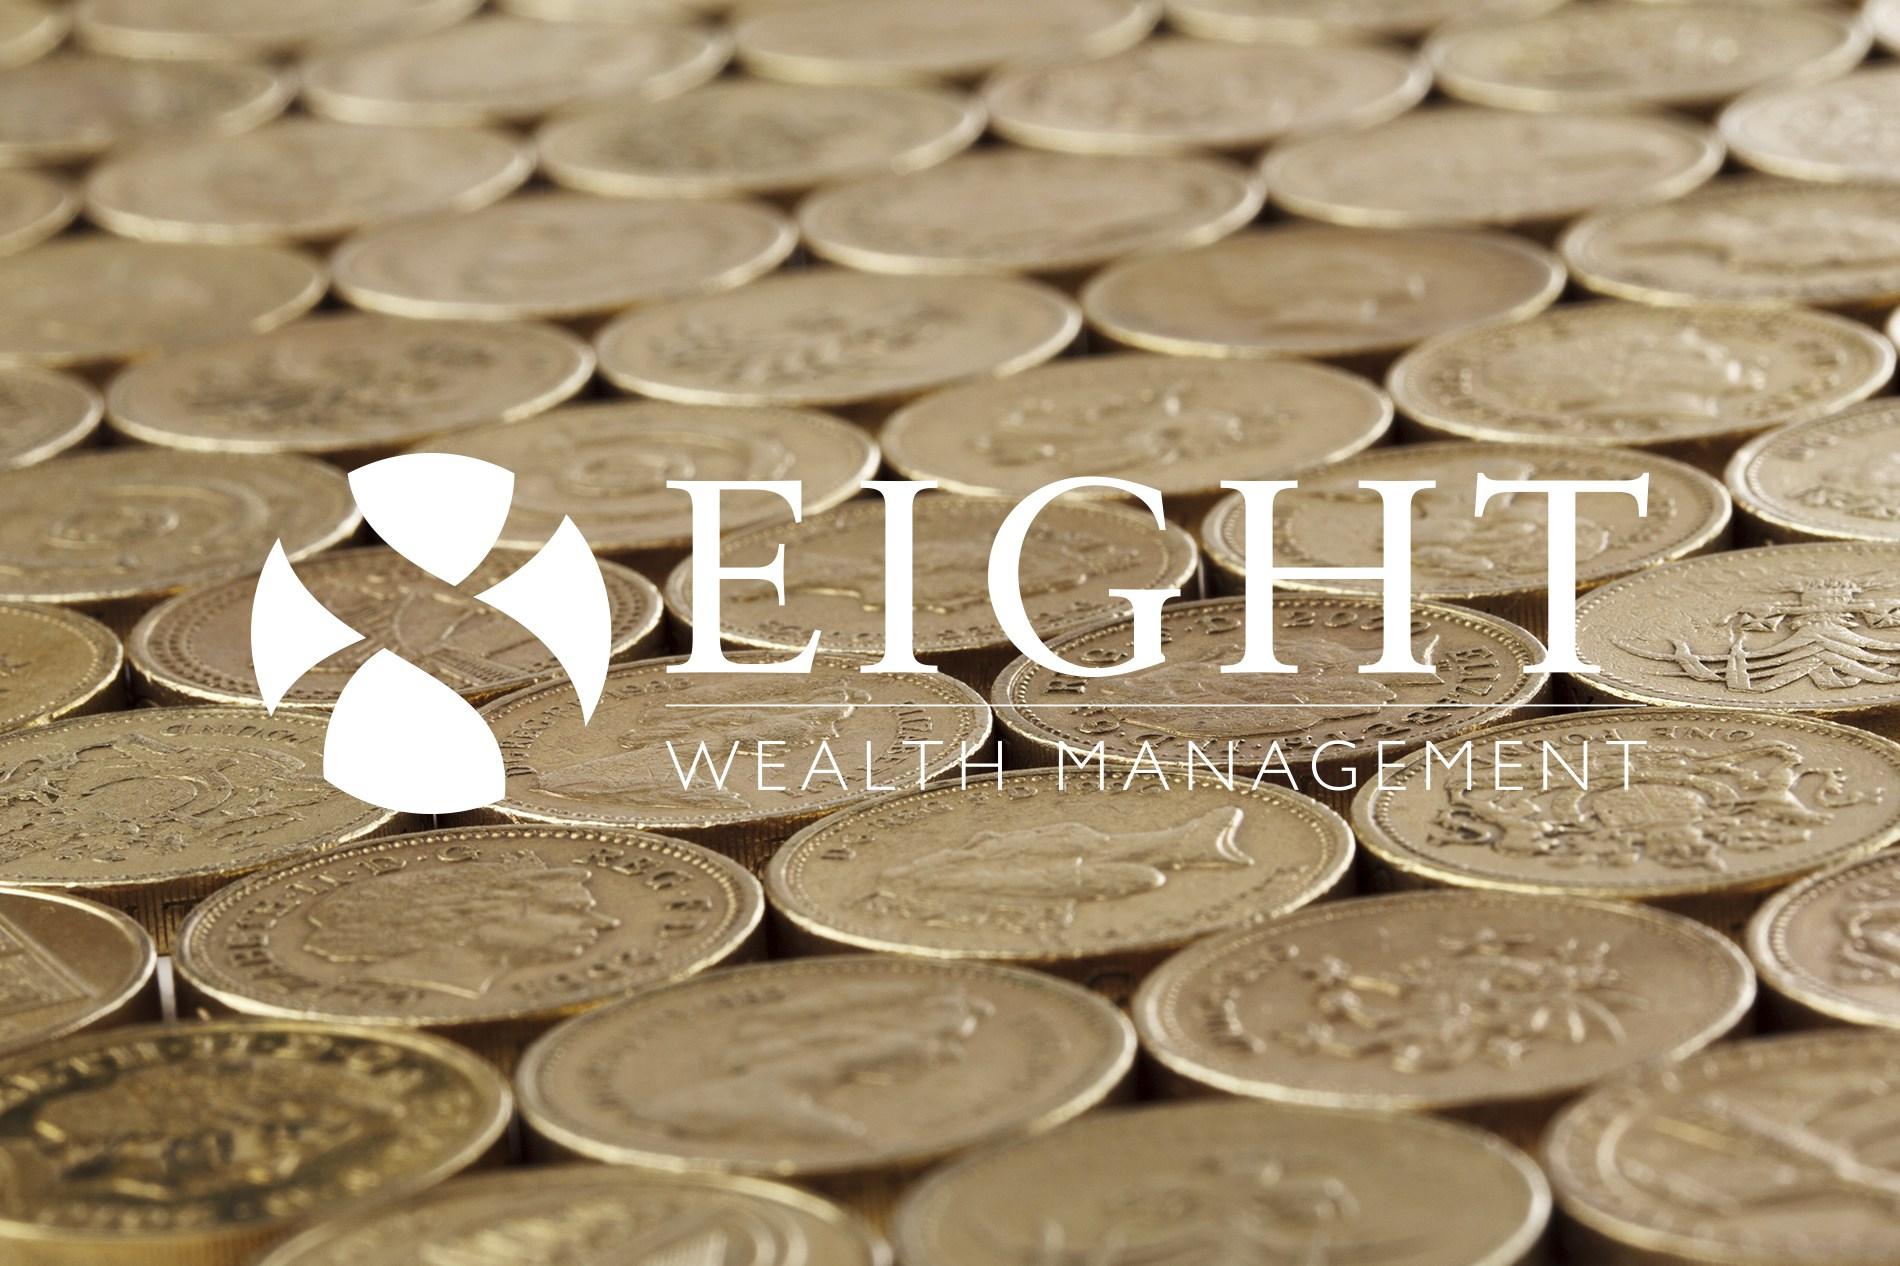 Eight-Wealth-Management-Fareham.jpg